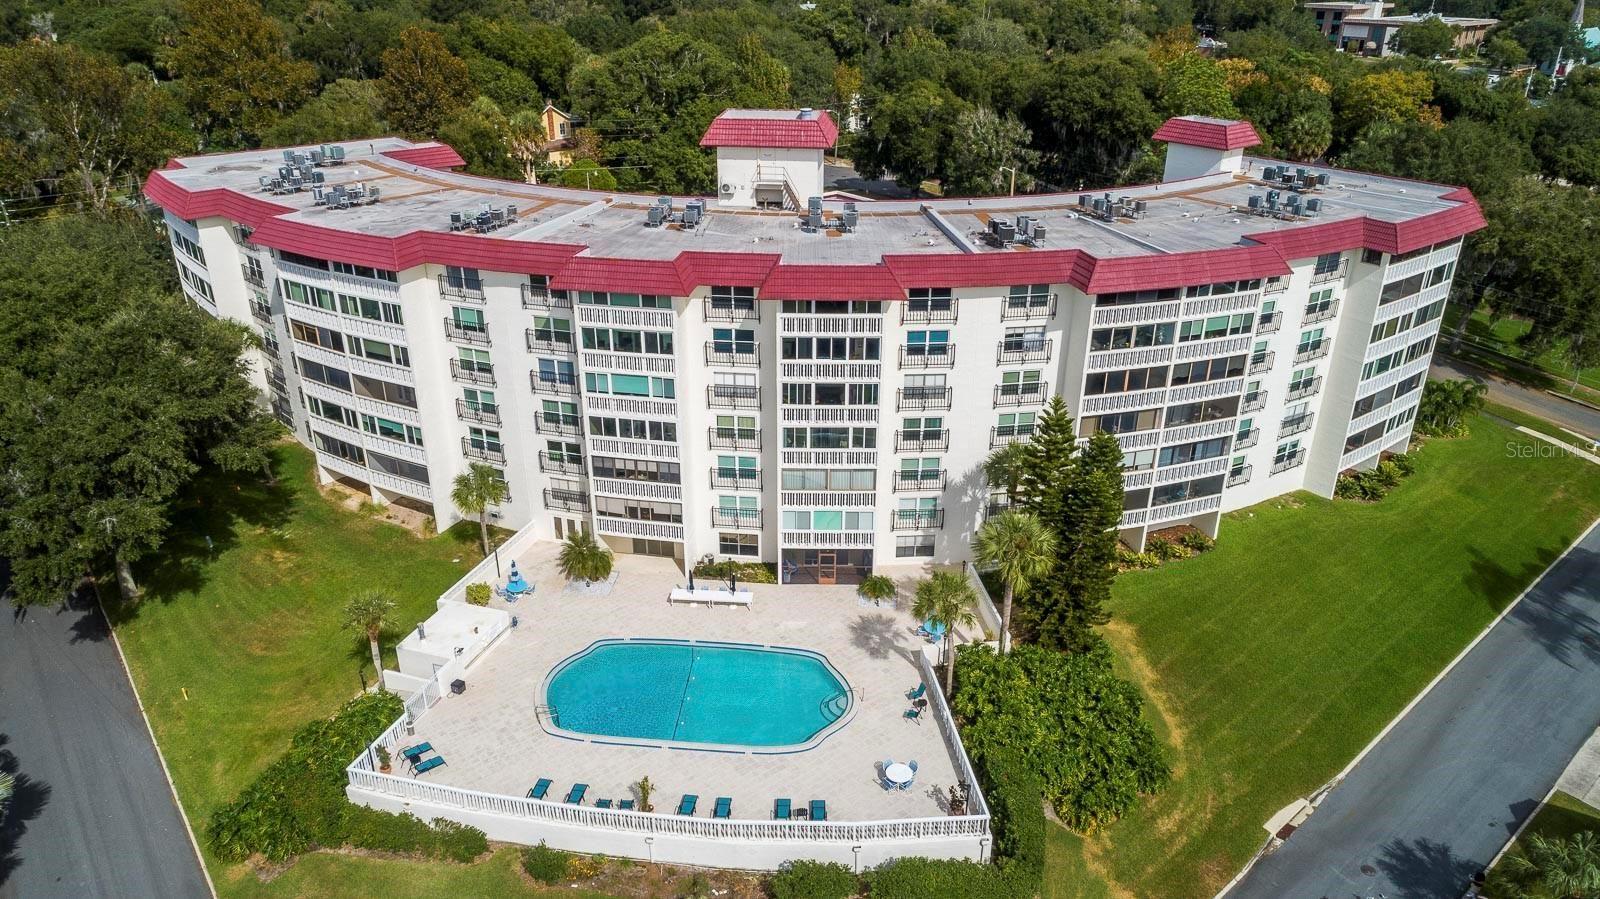 601 N MCDONALD STREET #506, Mount Dora, FL 32757 - MLS#: G5039201